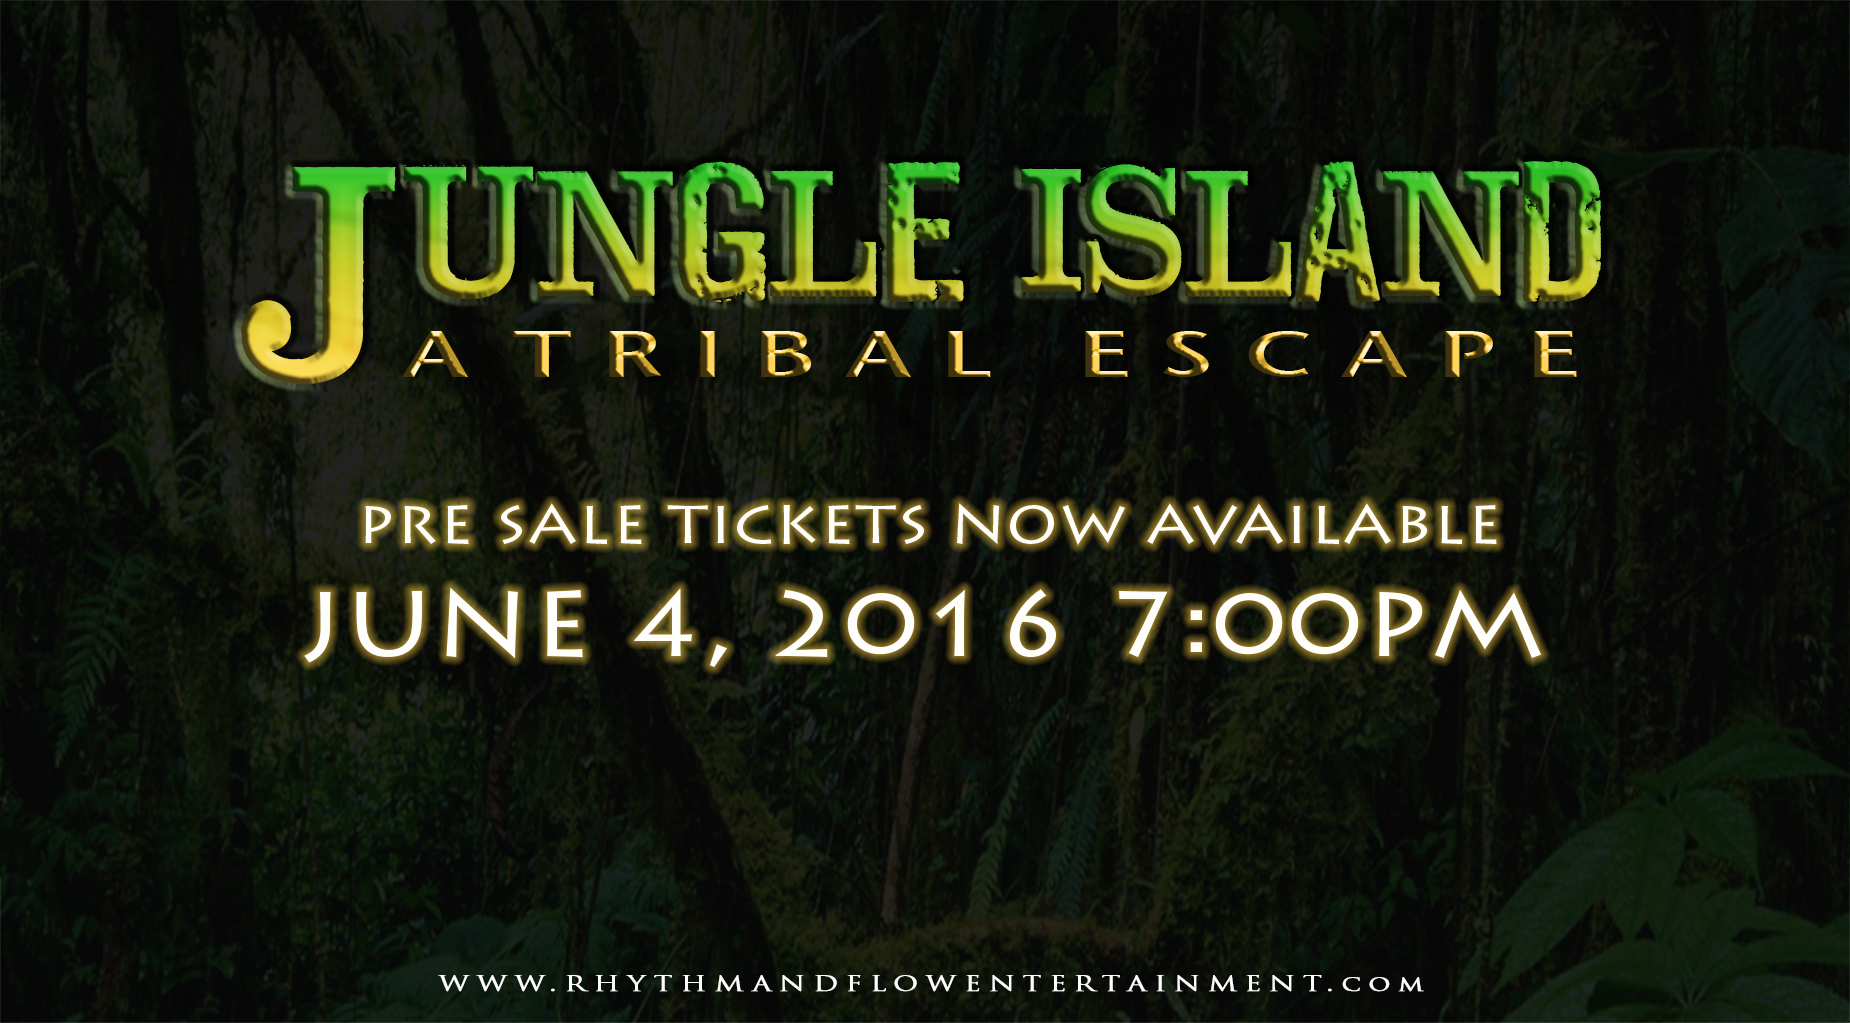 jungle island a tropical escape teaser pre sale ticket date.jpg